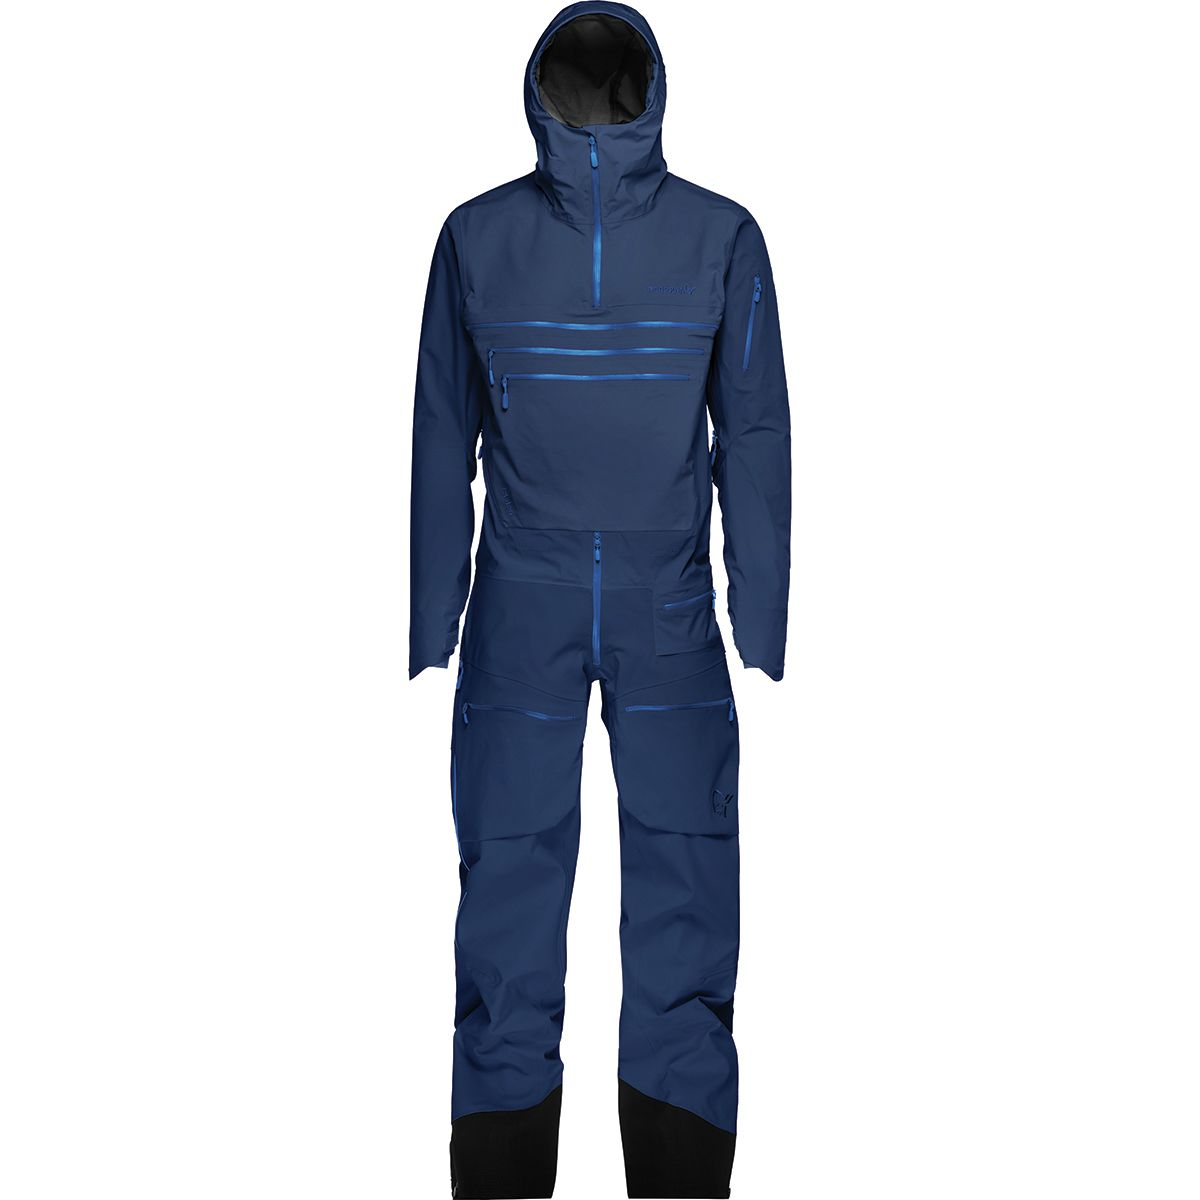 Norrona Lofoten Gore-Tex Pro Shell One-Piece Suit